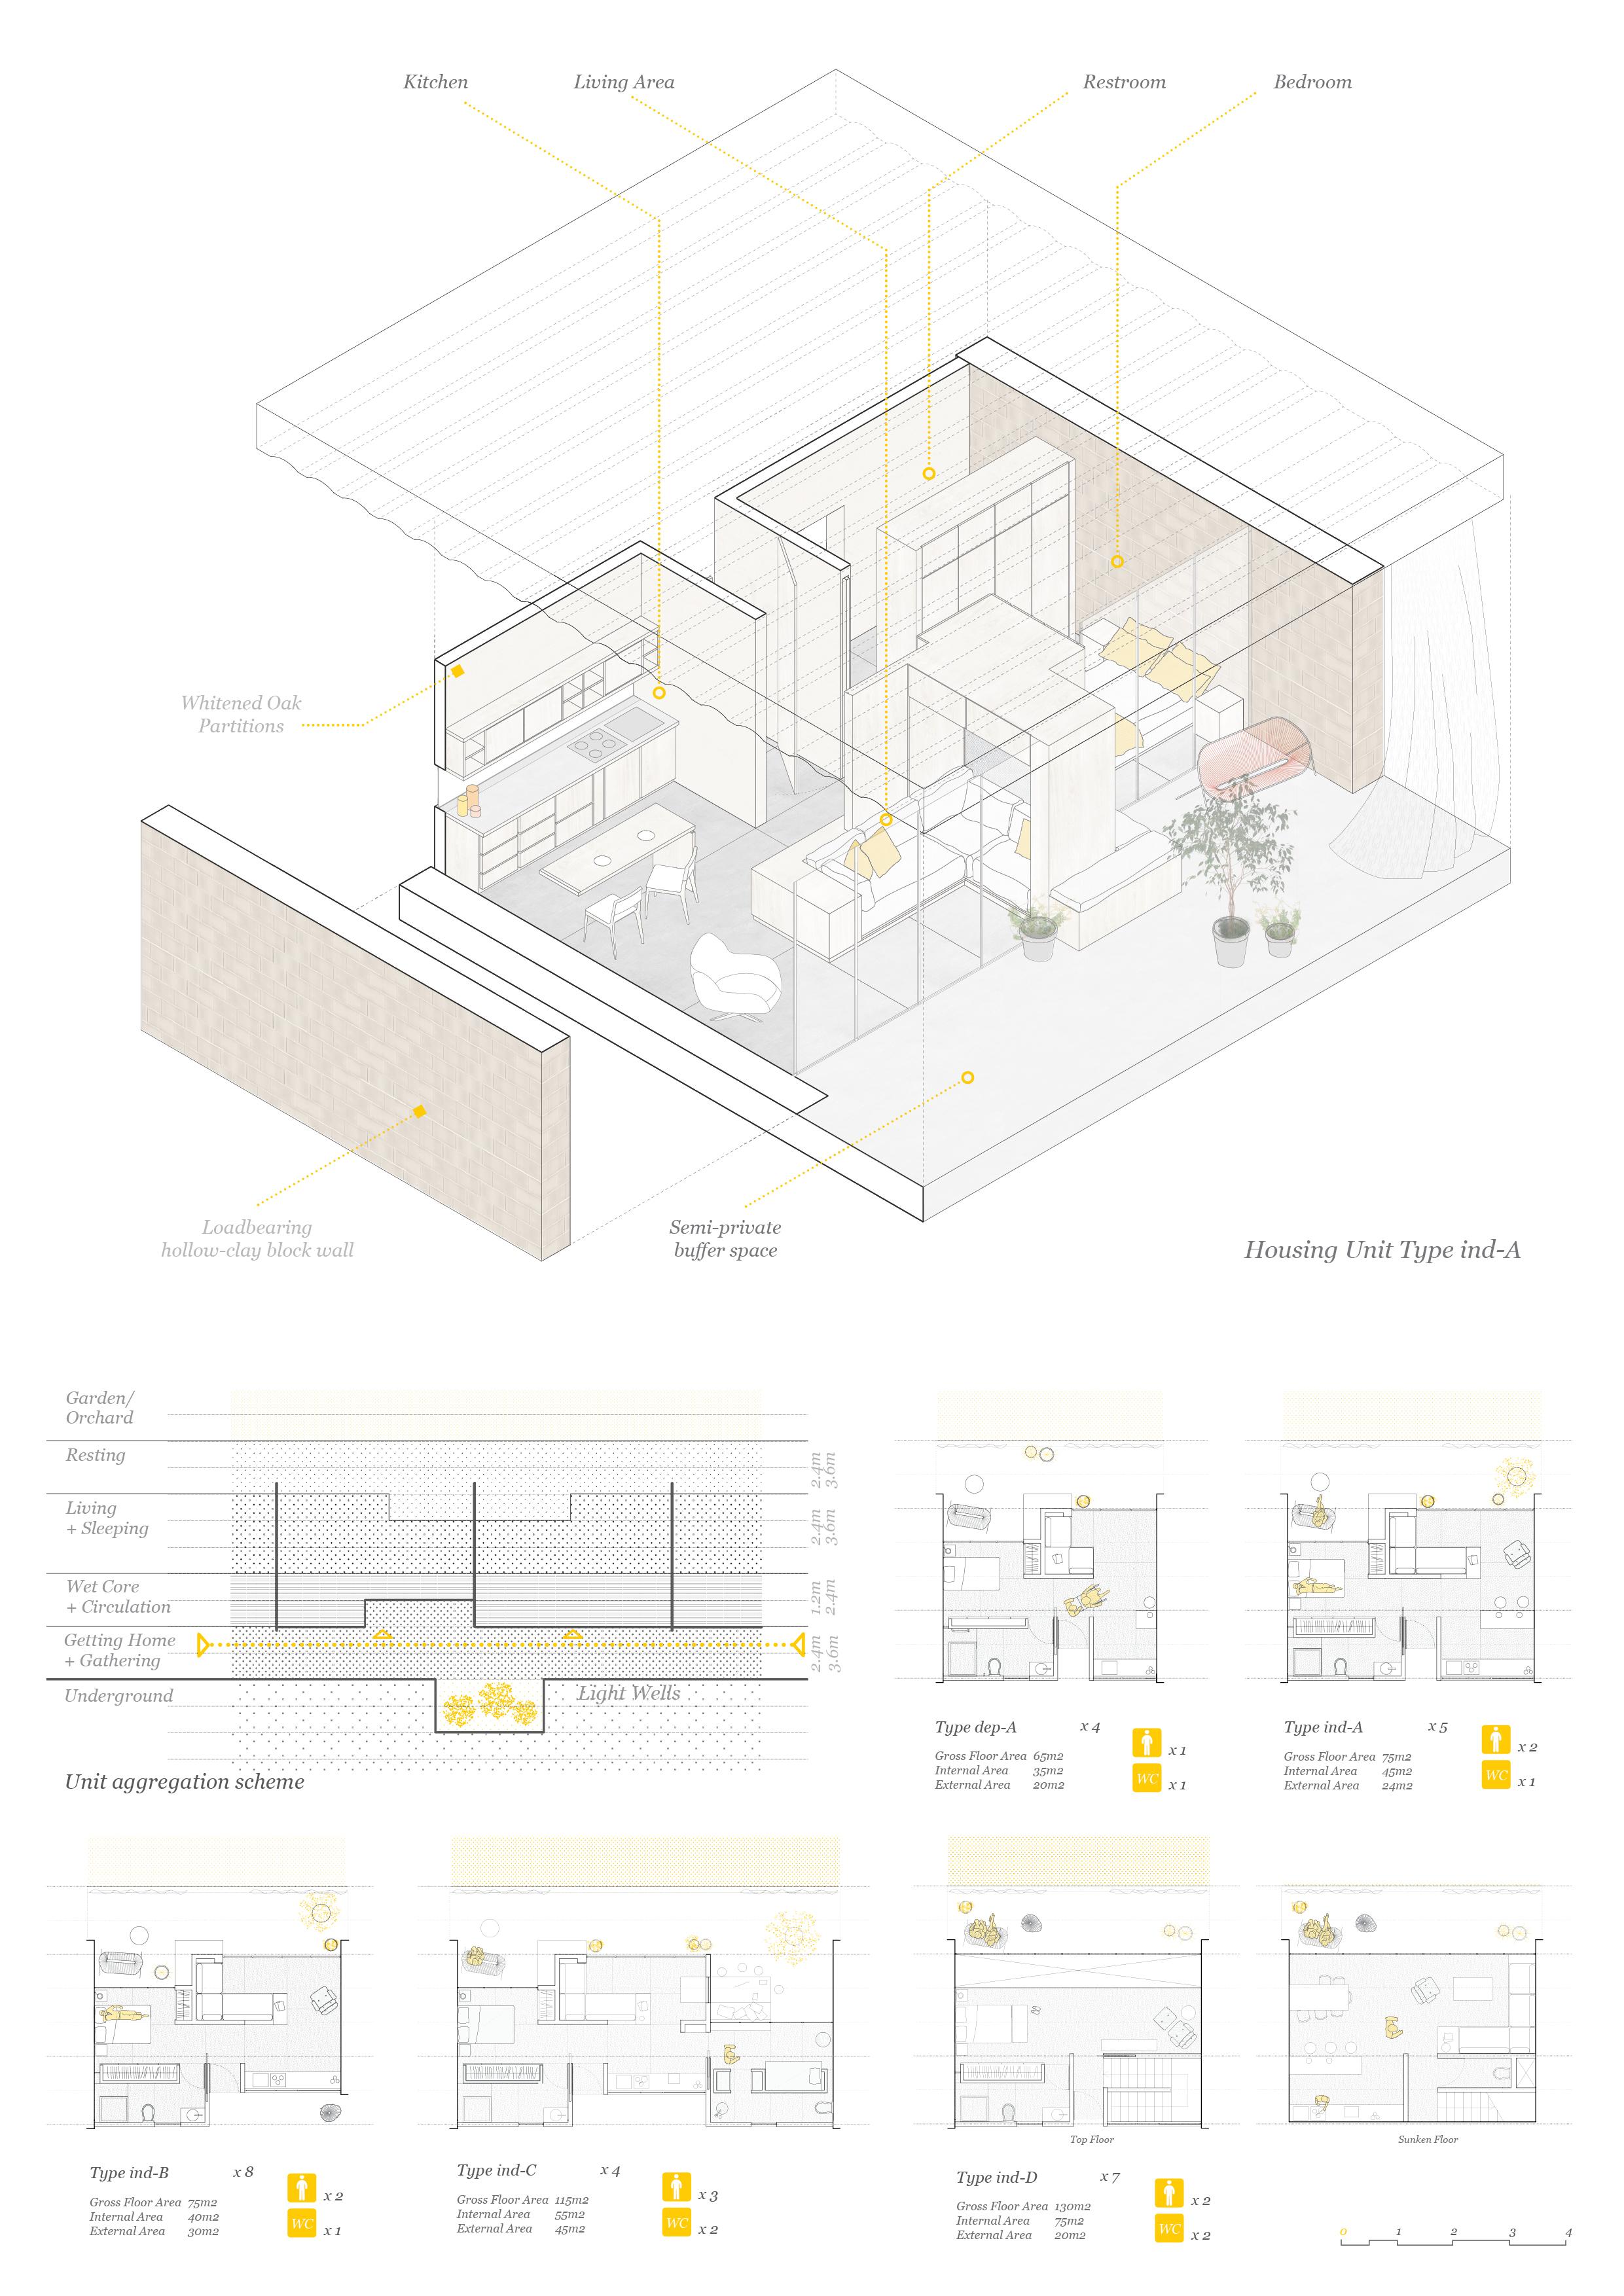 17_LL_HousingUnits.jpg